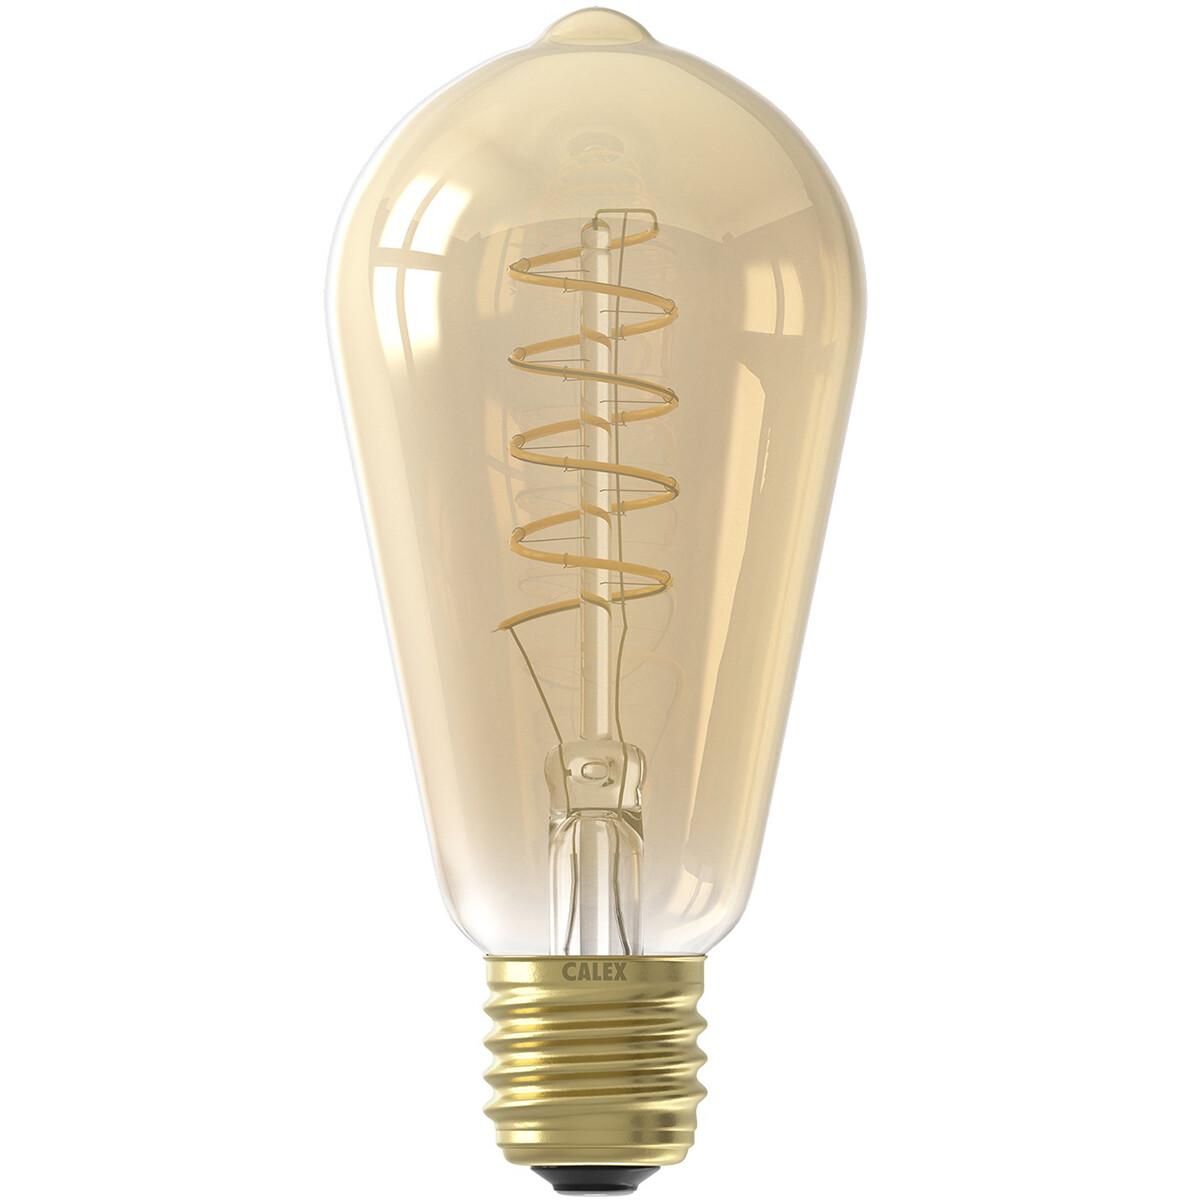 CALEX - LED Lamp - Filament ST64 - E27 Fitting - Dimbaar - 4W - Warm Wit 2100K - Amber